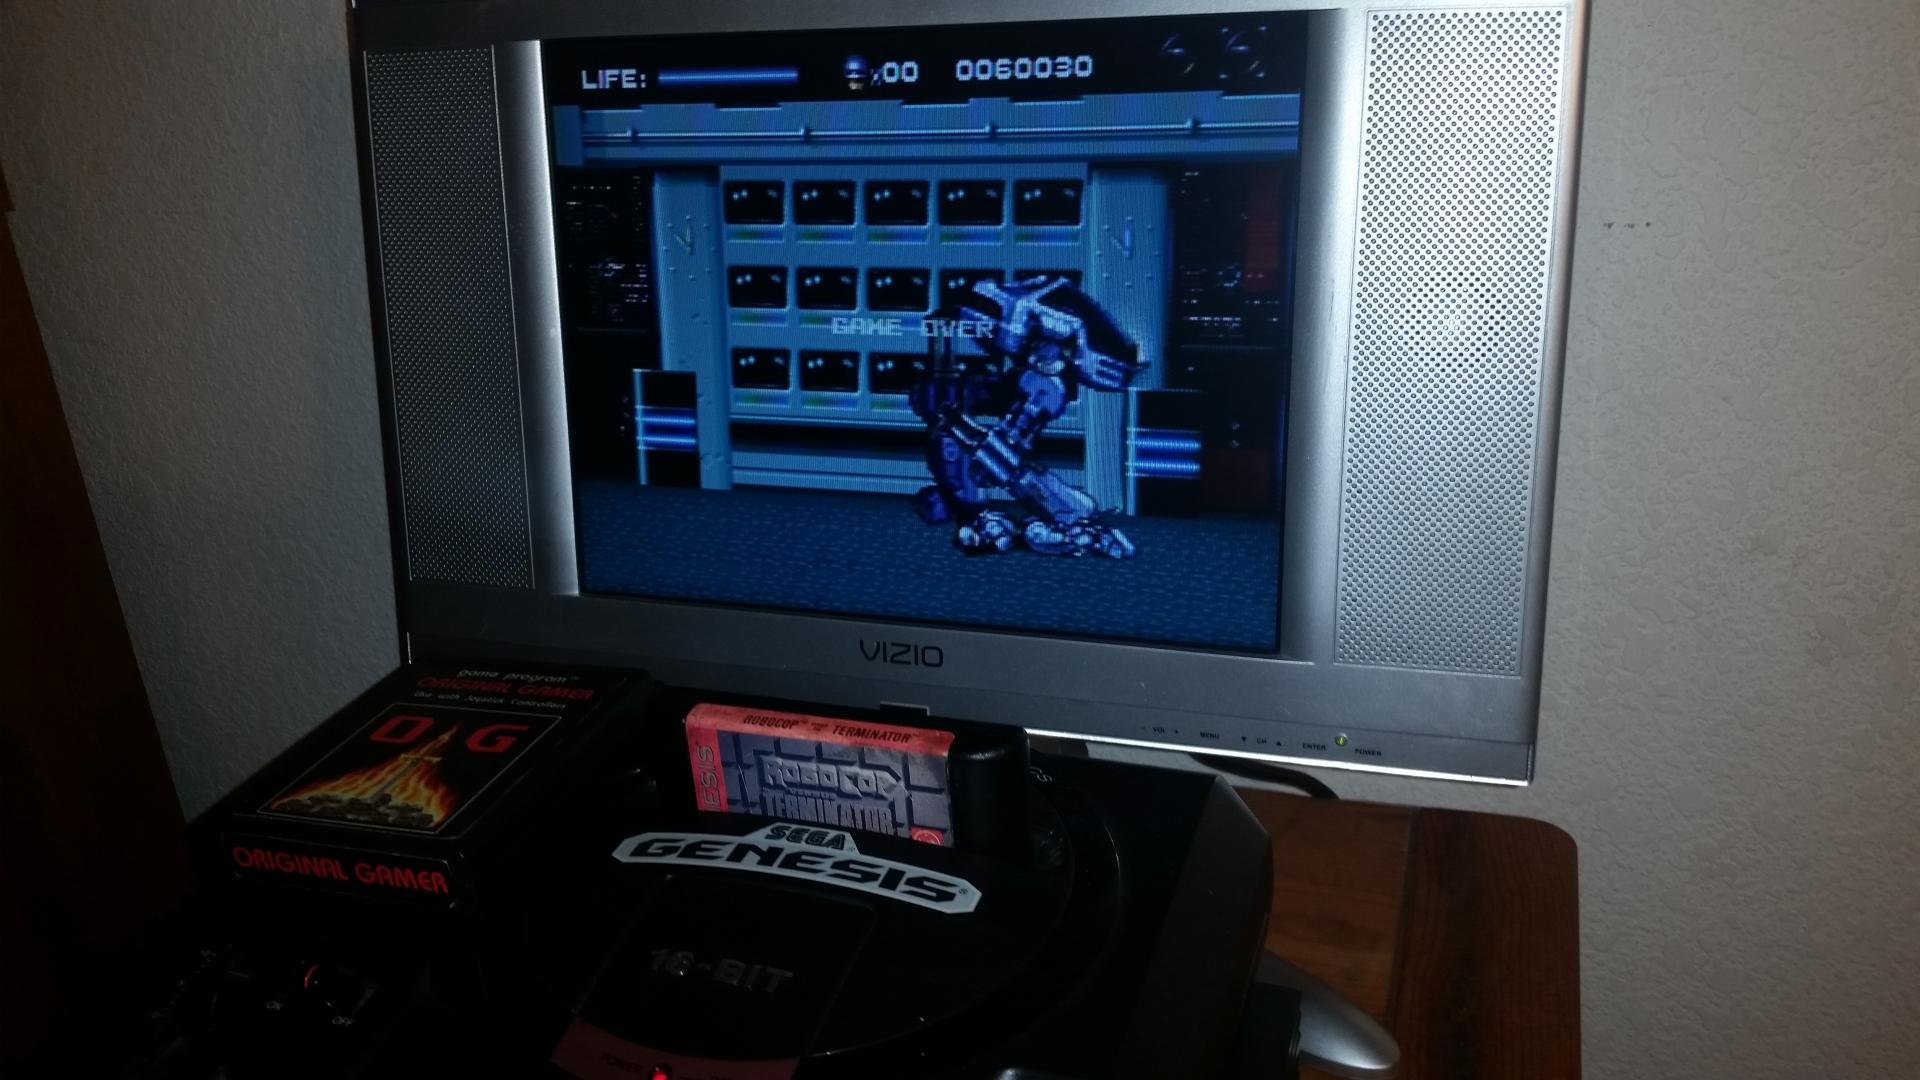 OriginalGamer: Robocop Versus Terminator (Sega Genesis / MegaDrive) 60,030 points on 2016-11-17 00:56:25